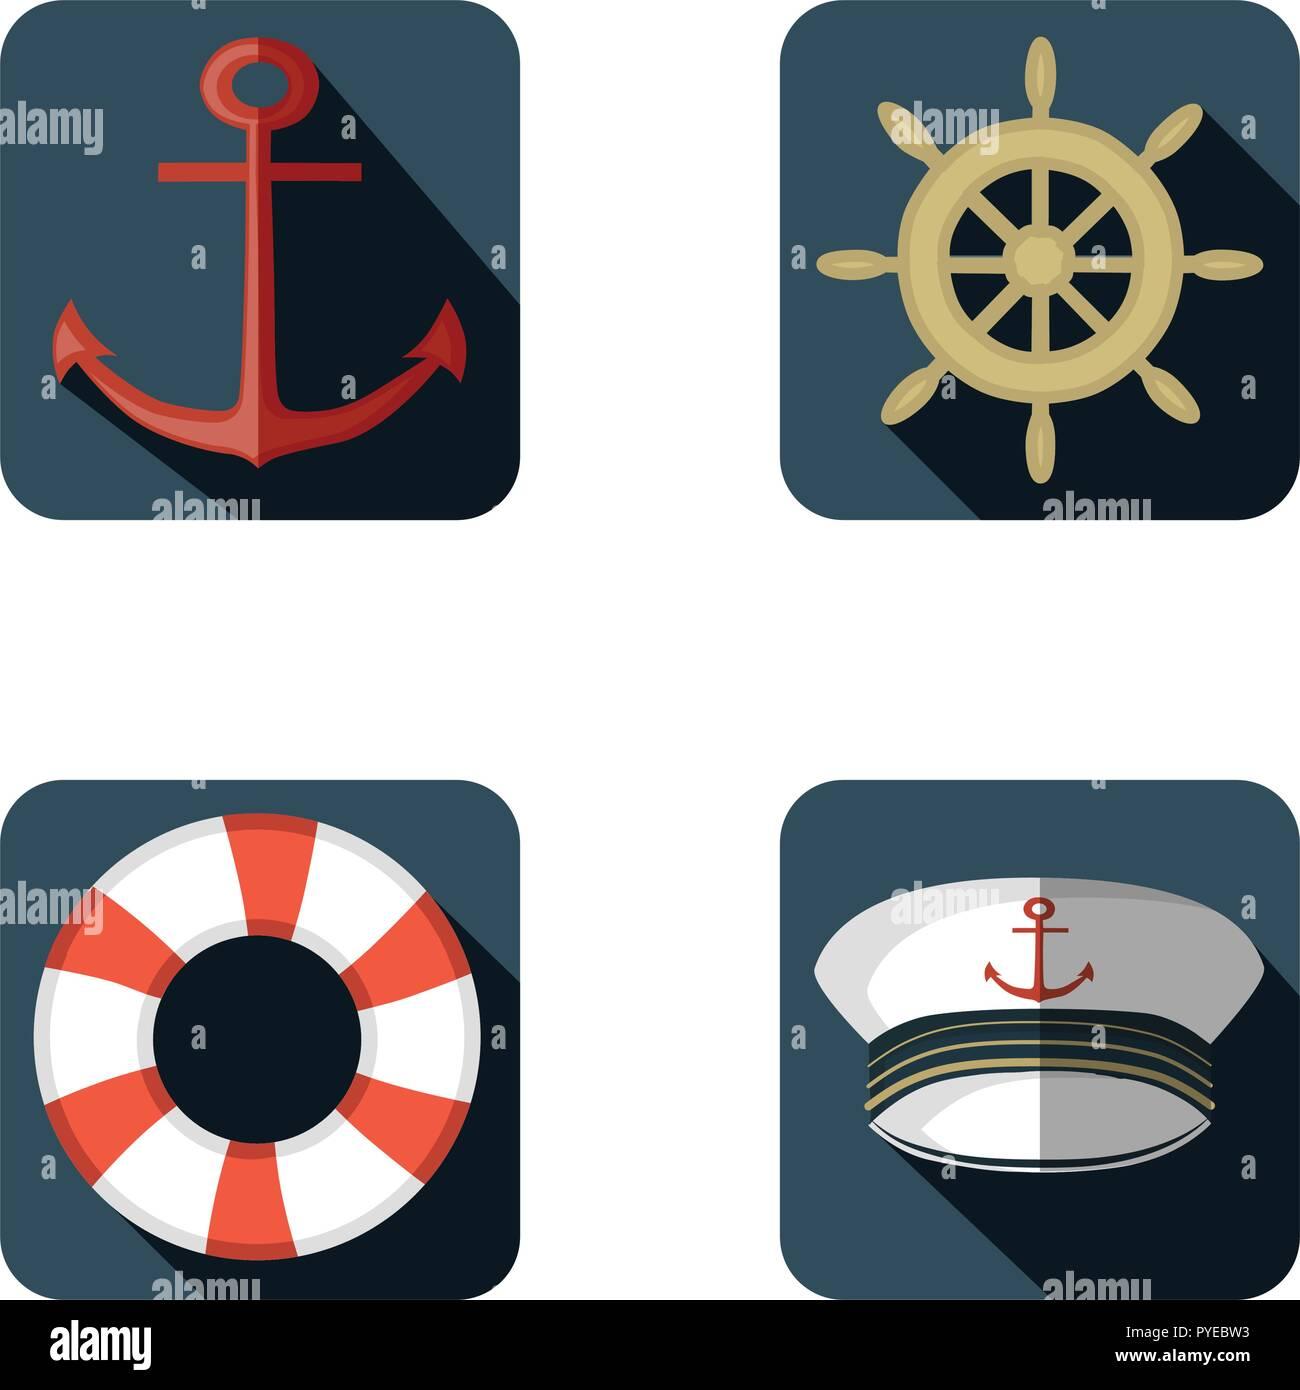 Navy icon set, flat design, vector illustration - Stock Vector